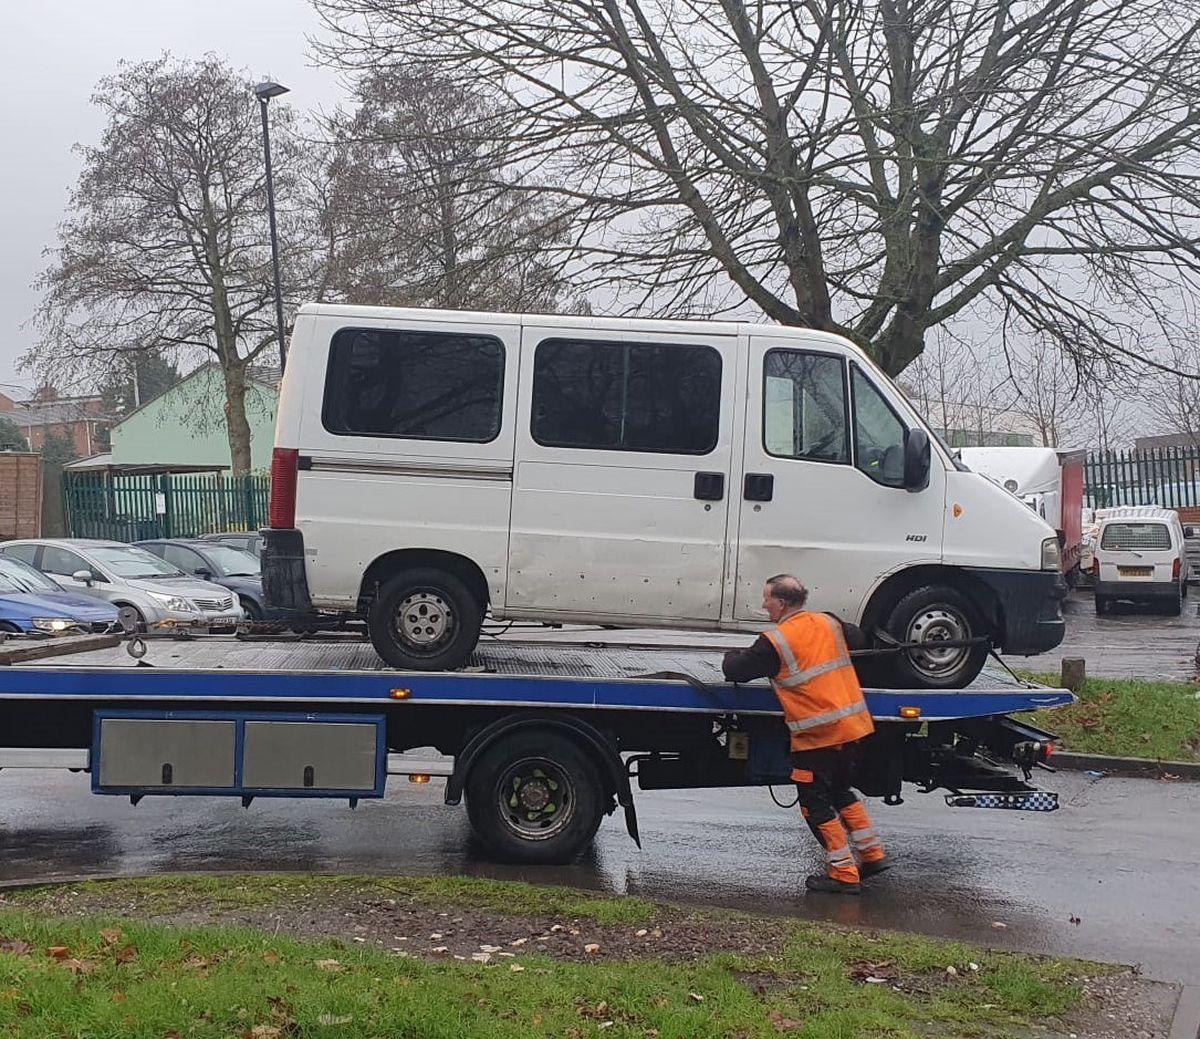 The seized van